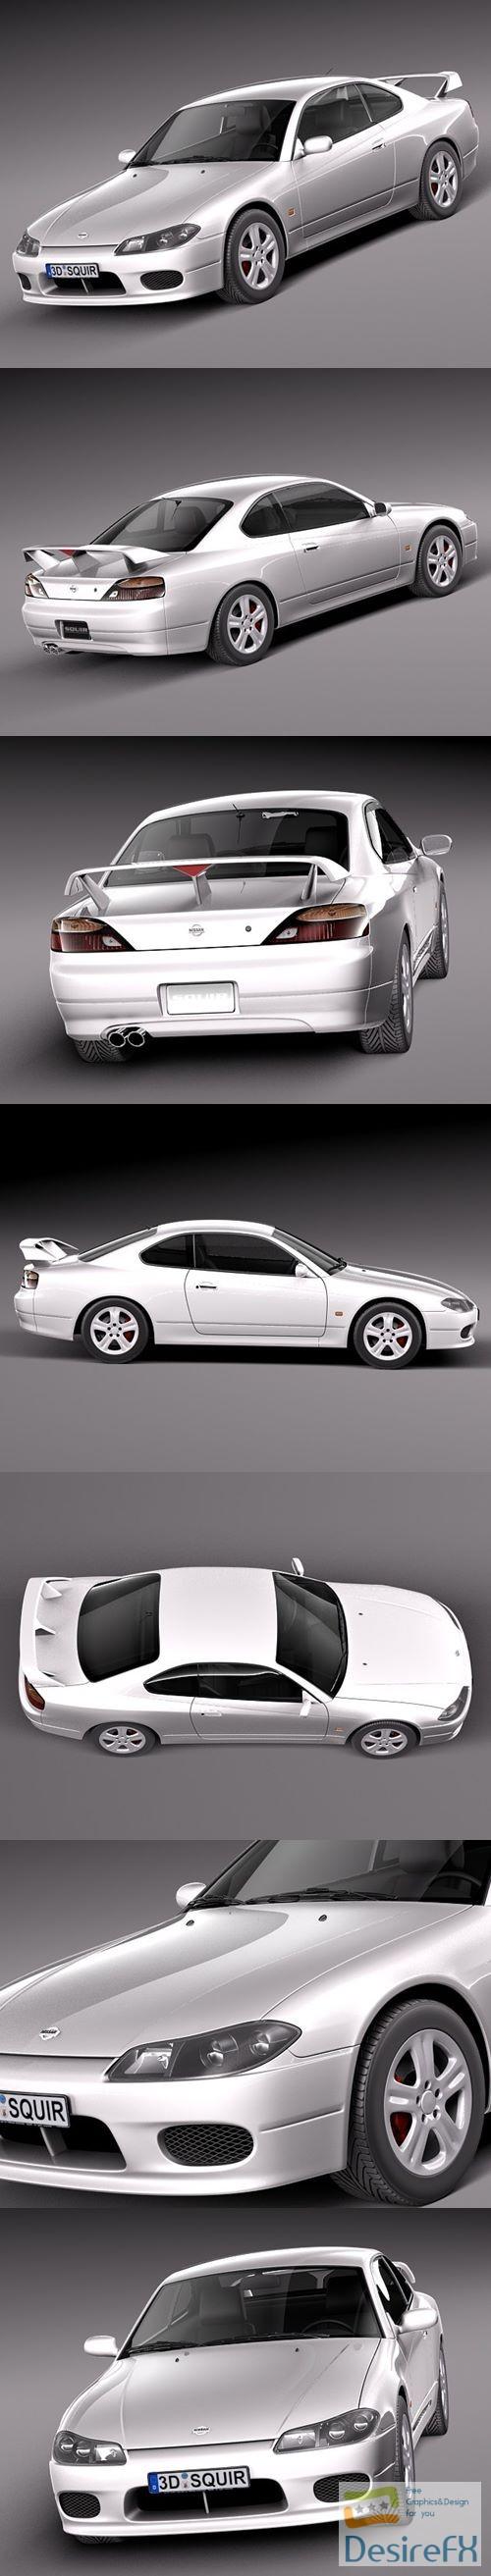 Nissan 240 sx Silvia S15 1999-2002 3D Model